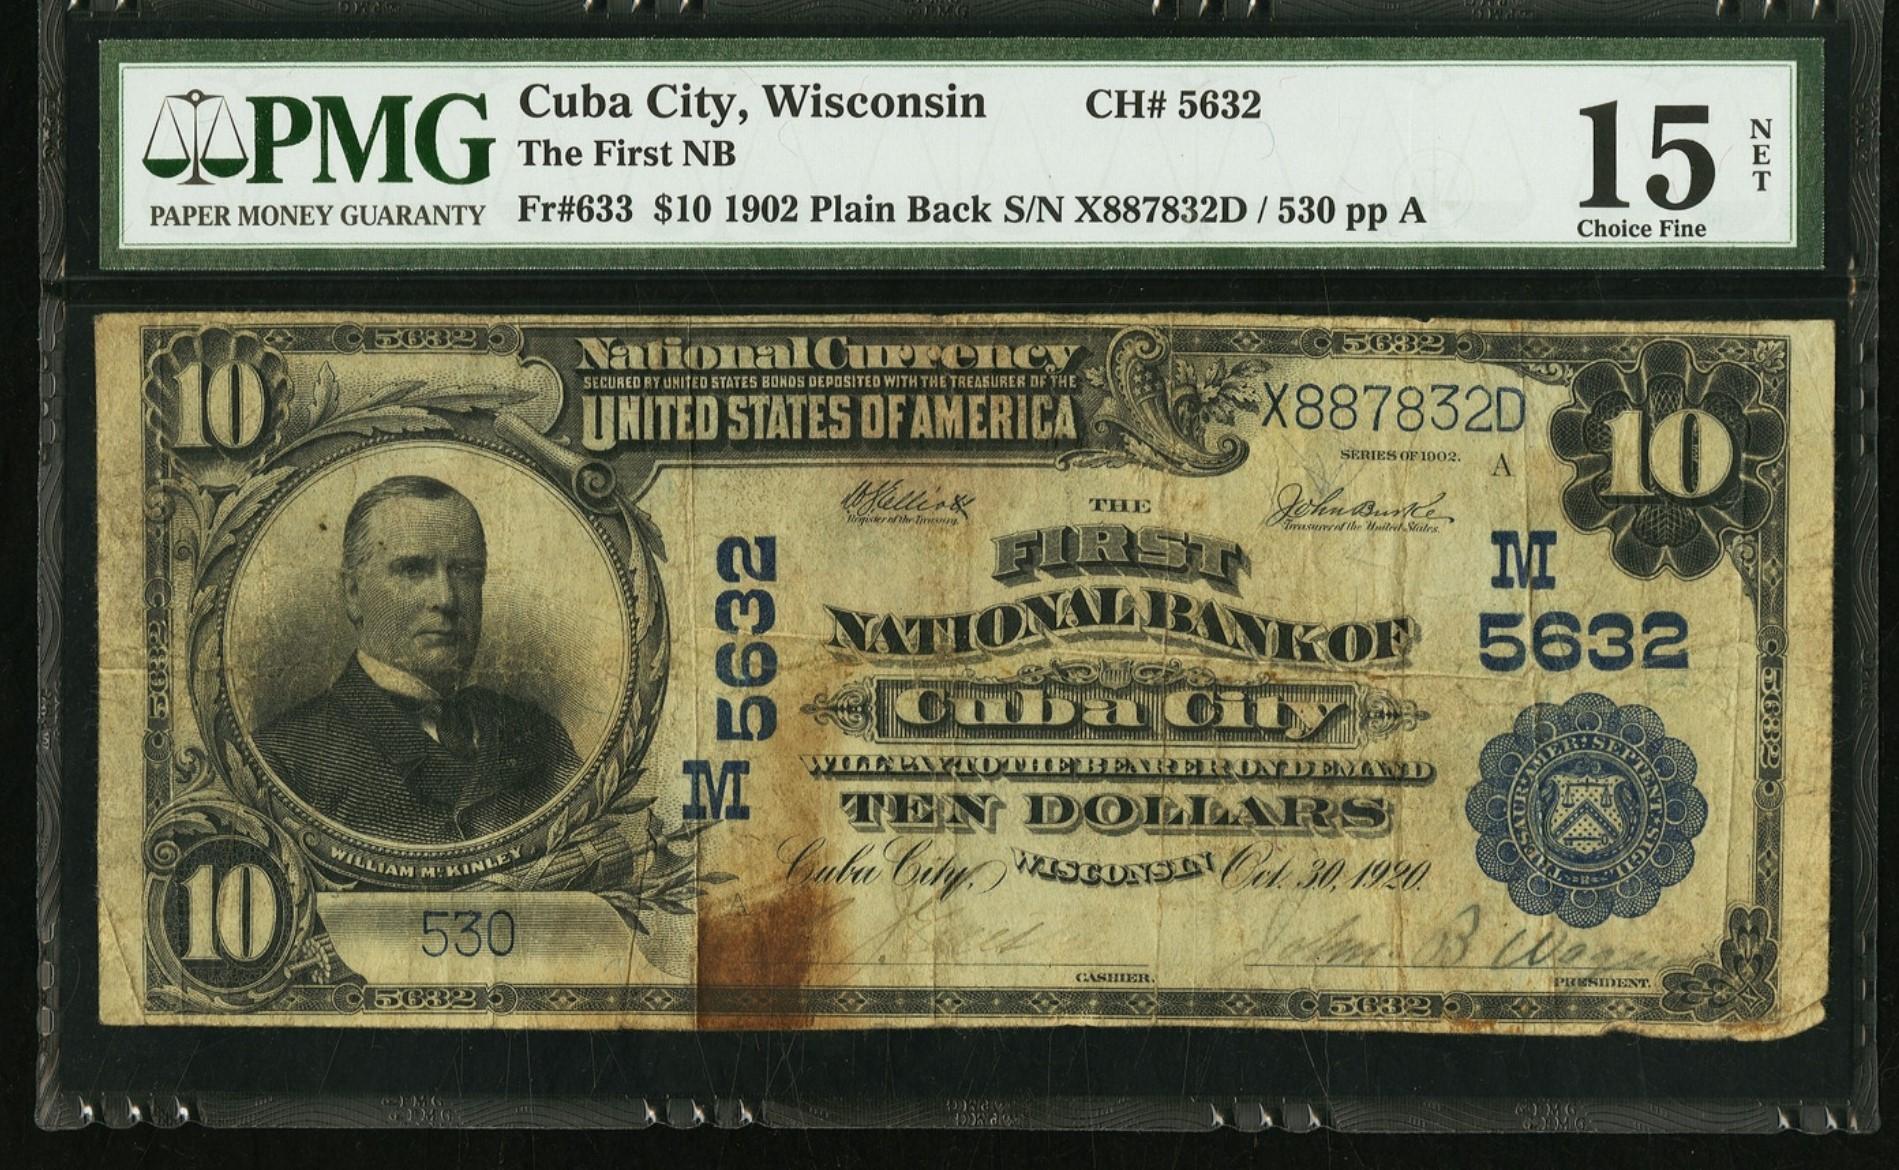 Cuba City, 02PB, ch.5632, FNB, $10, PMG15 front.jpg